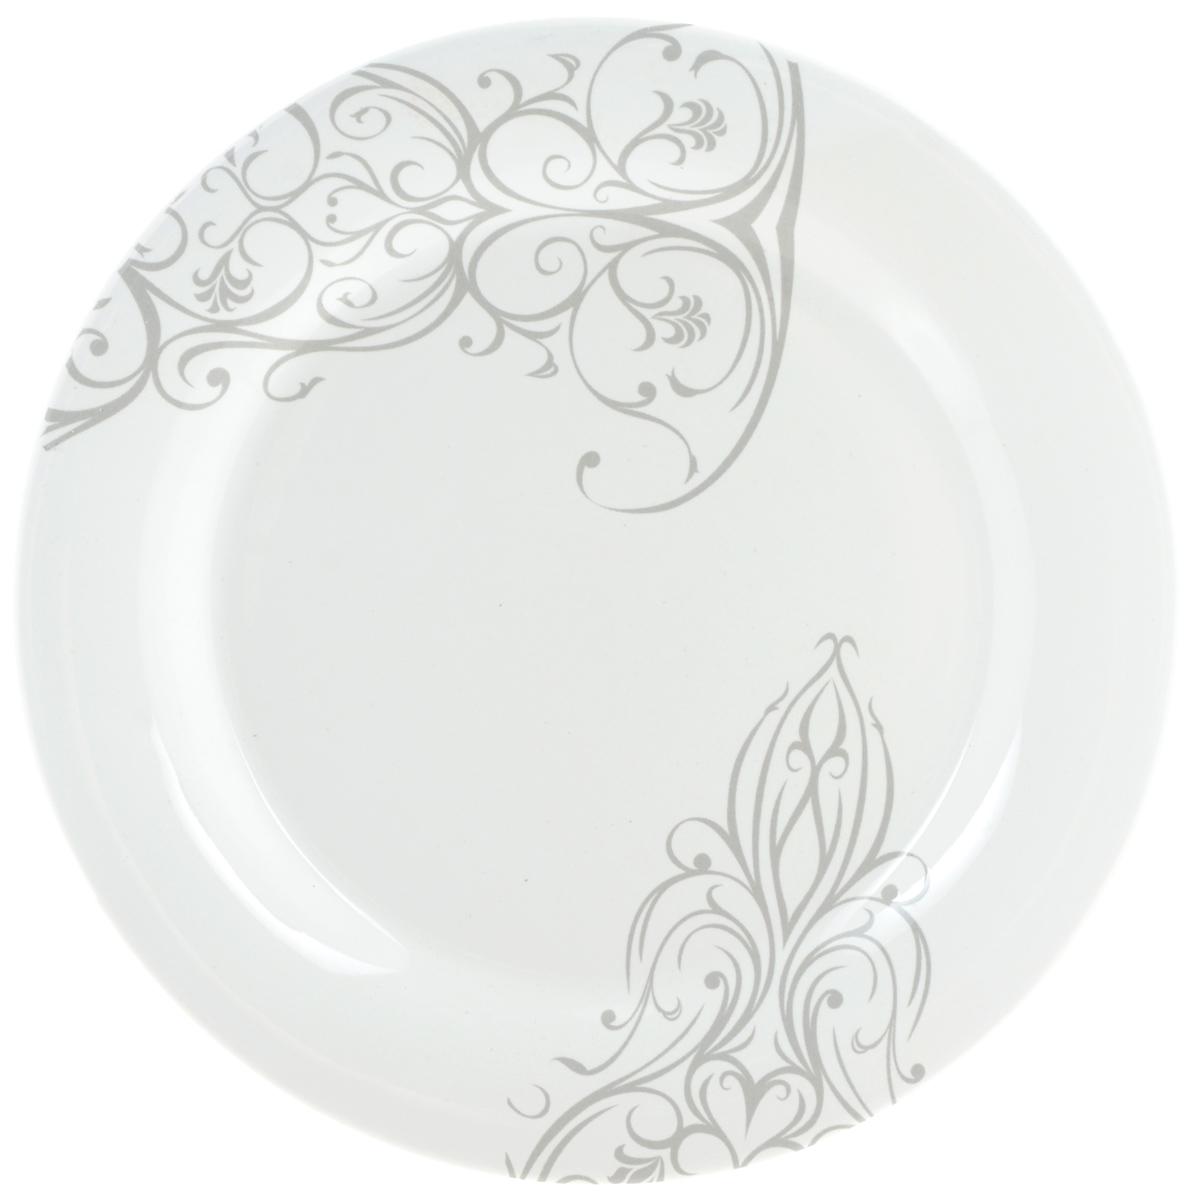 Тарелка десертная Ceramiche Viva Черный ирис, диаметр 20 см кружка ceramiche viva фреско cv2 t07 06048 al